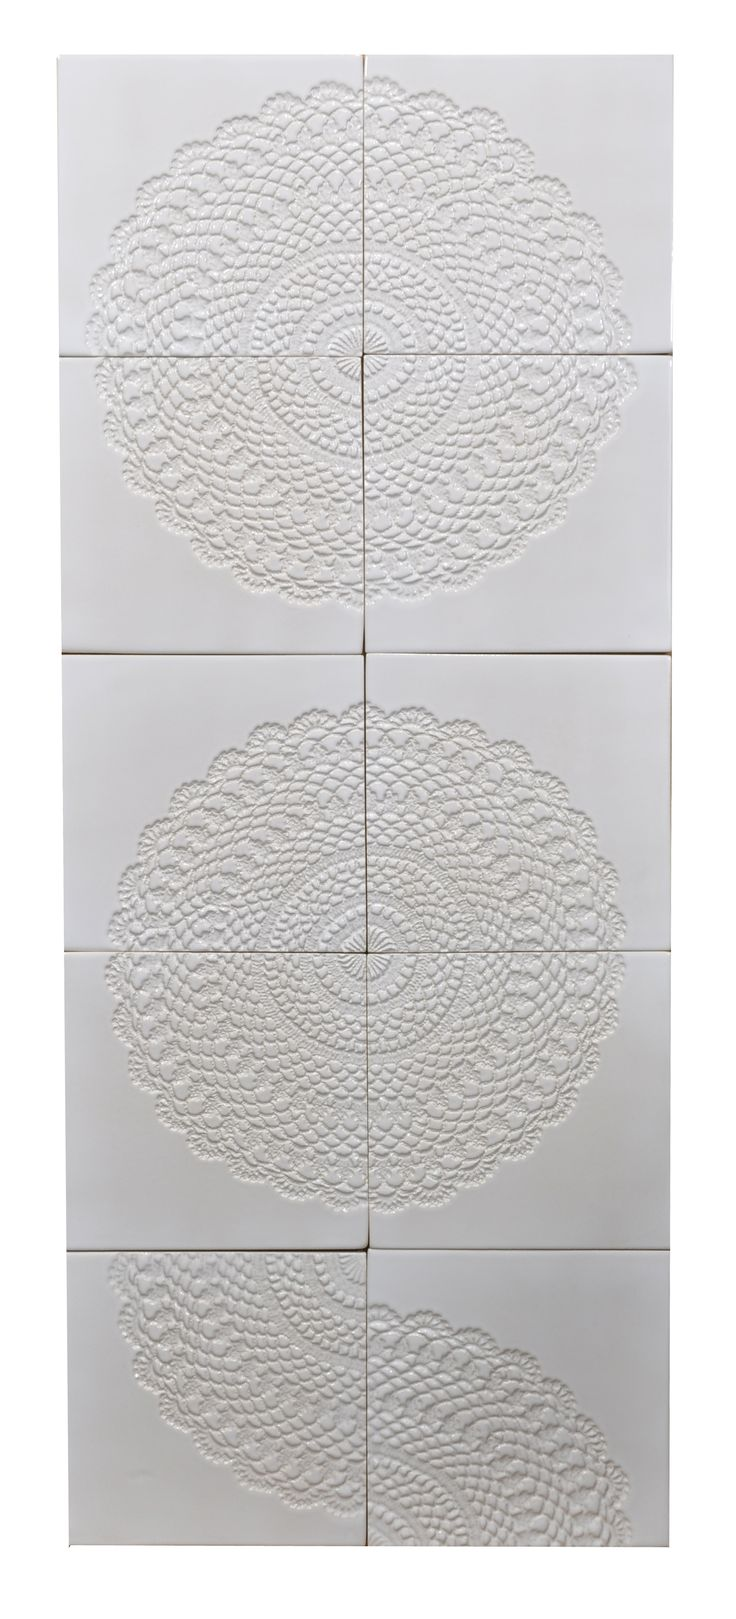 "Handmade tiles ""large round crown"". Design and construction Inżynieria Designu."